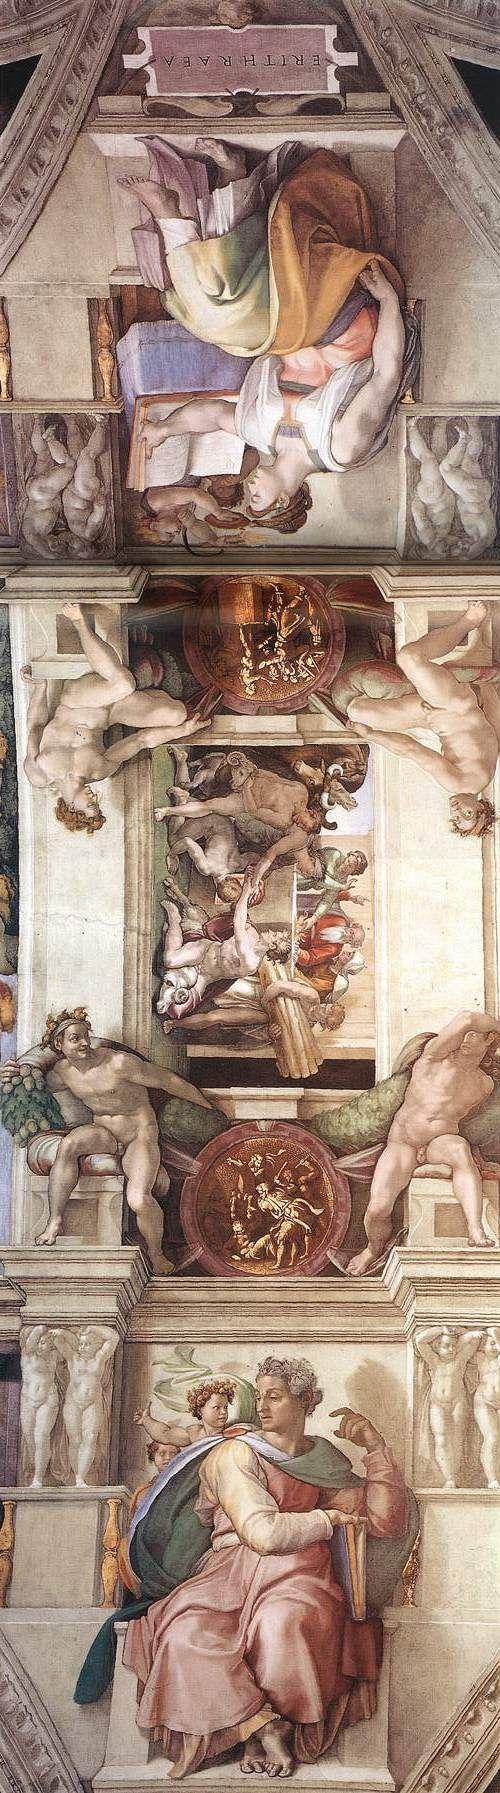 ❤ - MICHELANGELO BUONARROTI - (1475 - 1564) - Sistine Chapel - Ceiling.